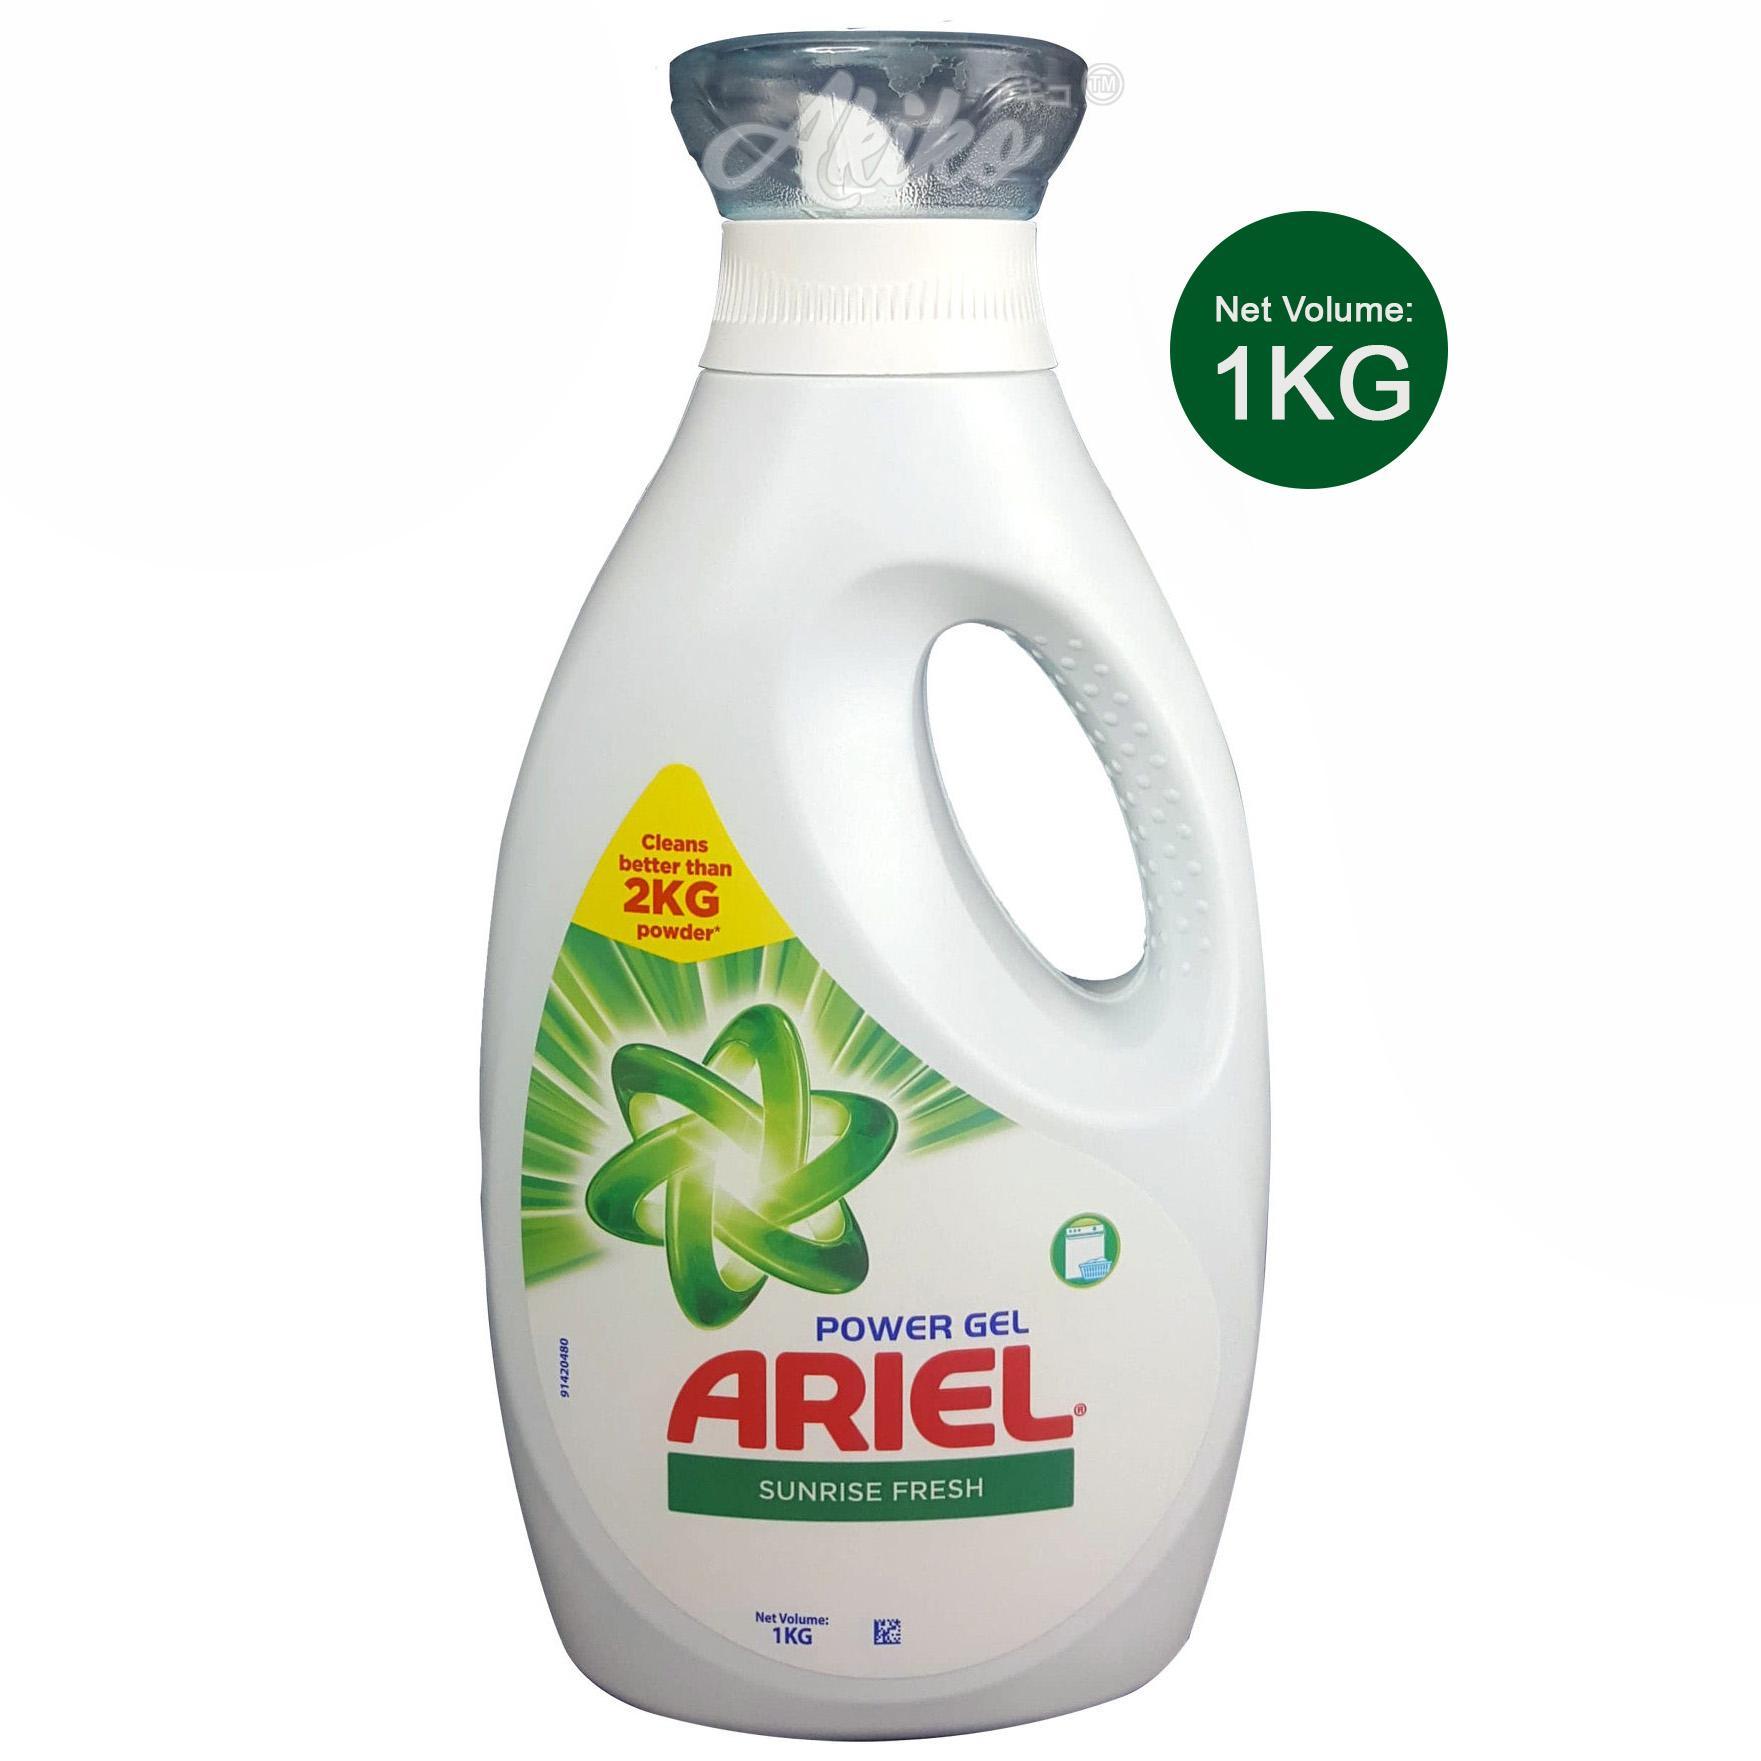 Ariel Power Gel Sunrise Fresh Liquid Detergent 1L